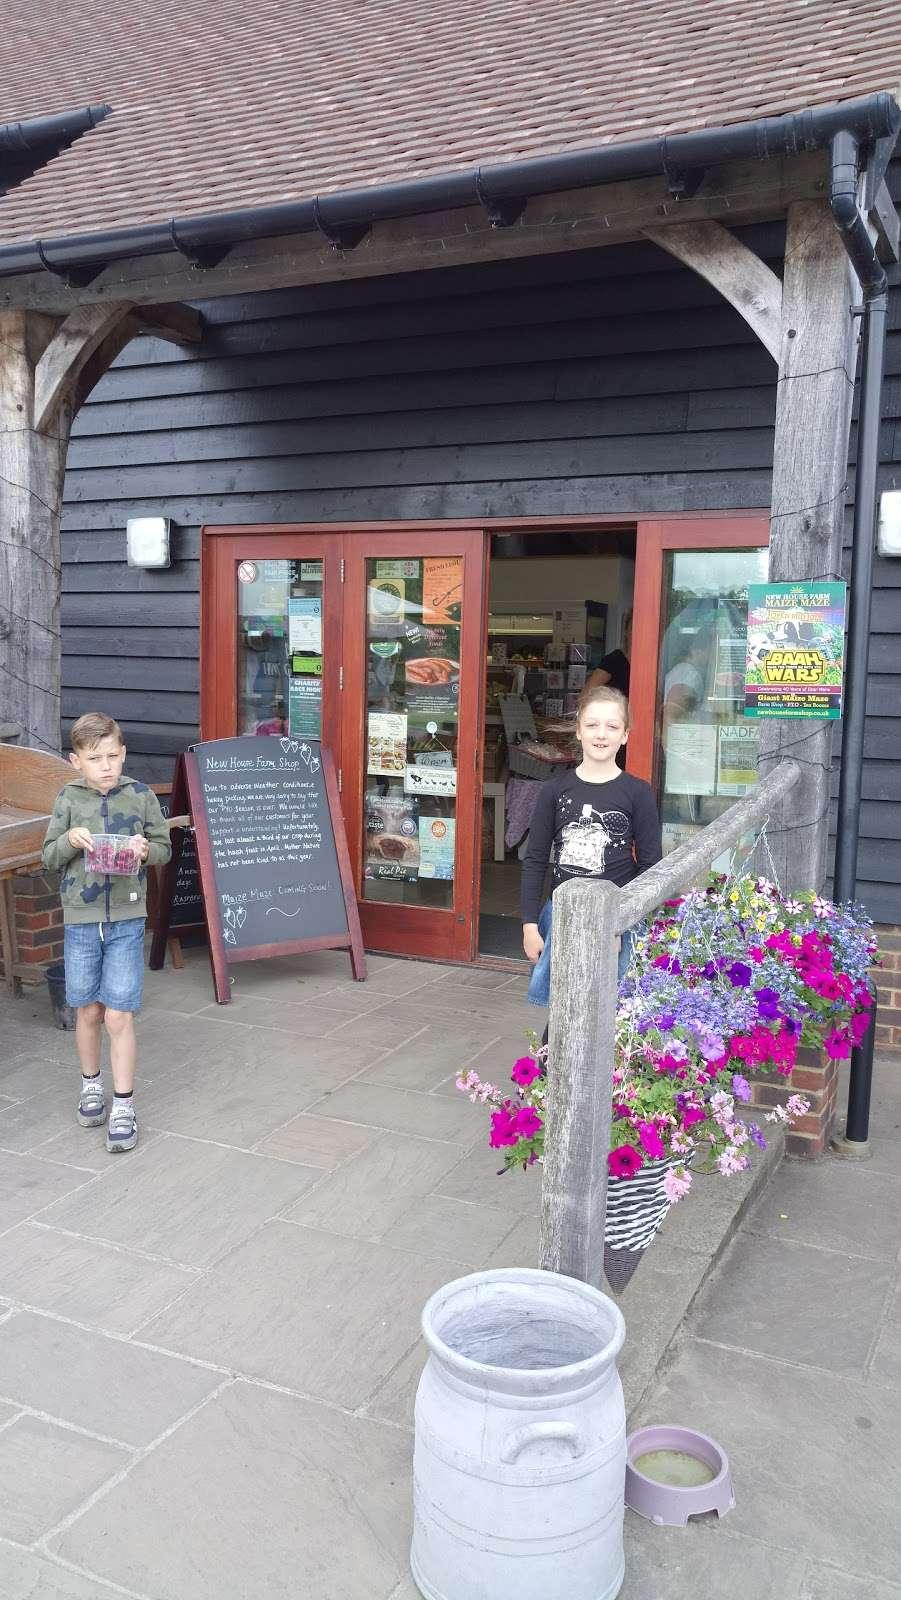 New House Farm Shop - cafe  | Photo 3 of 10 | Address: Old Crawley Rd, Faygate, Horsham RH12 4RU, UK | Phone: 01293 851890